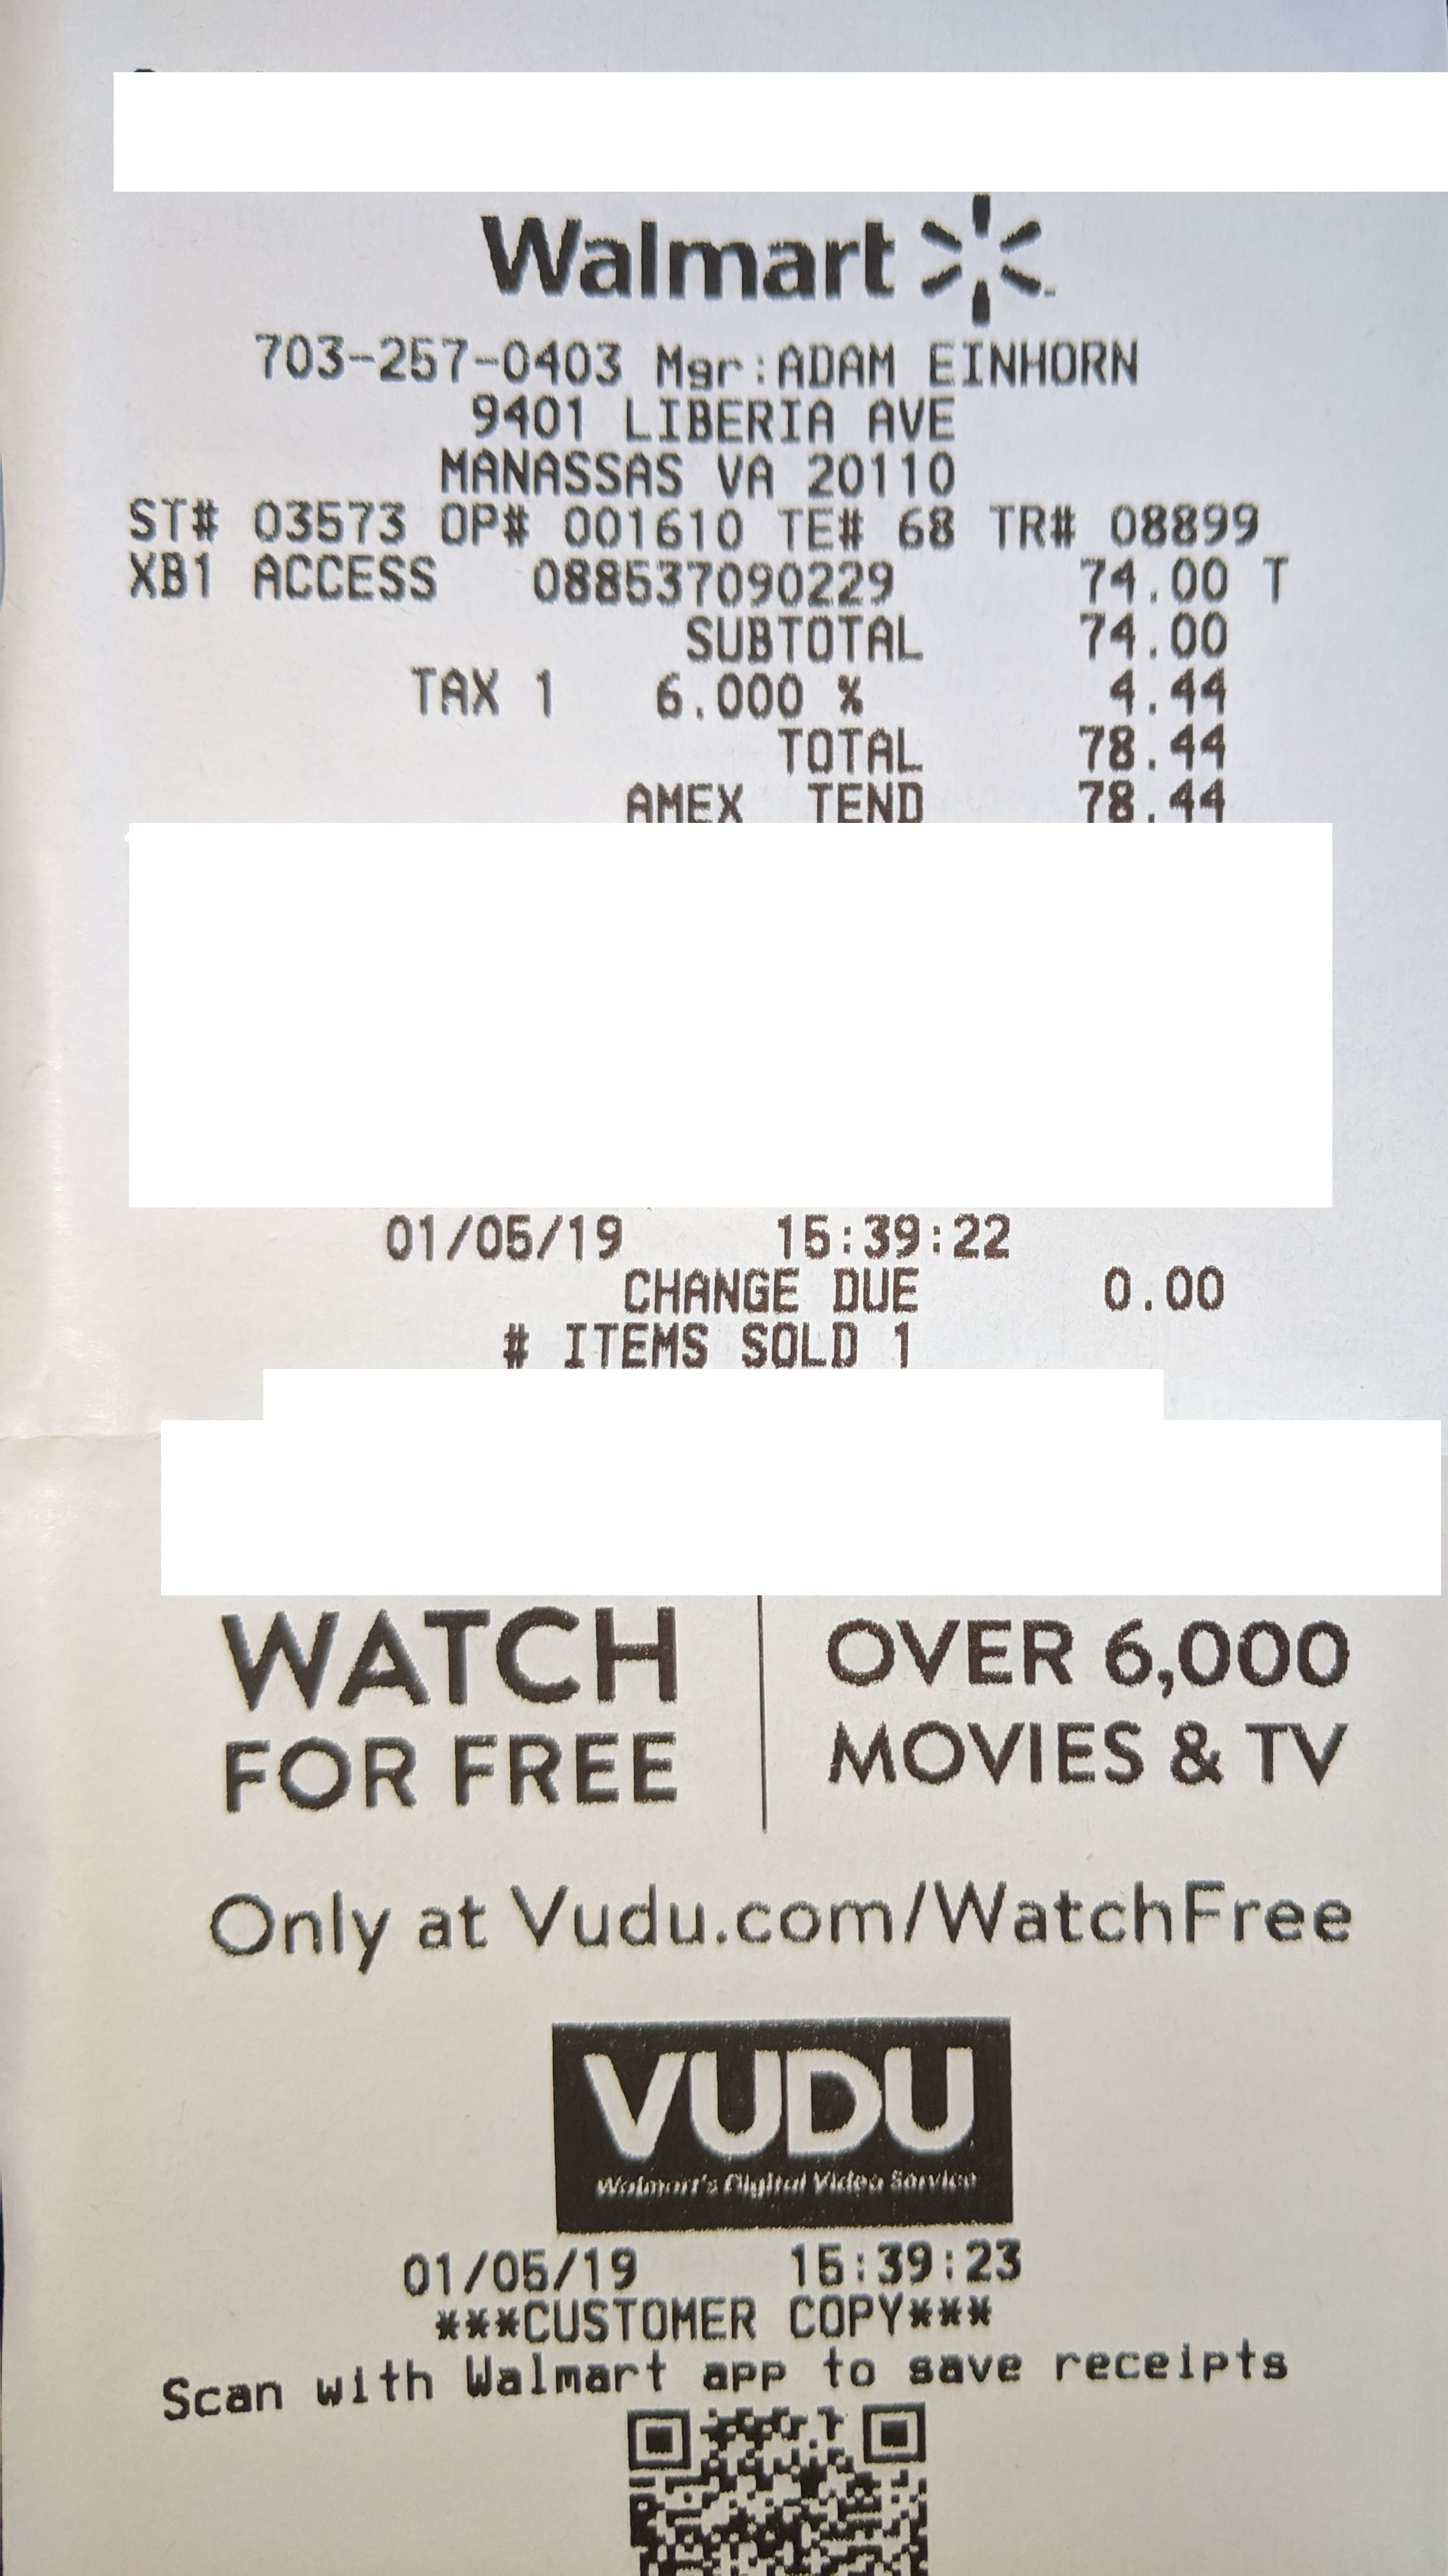 Xbox Elite Controller Clearance $74 00 YMMV -- Walmart